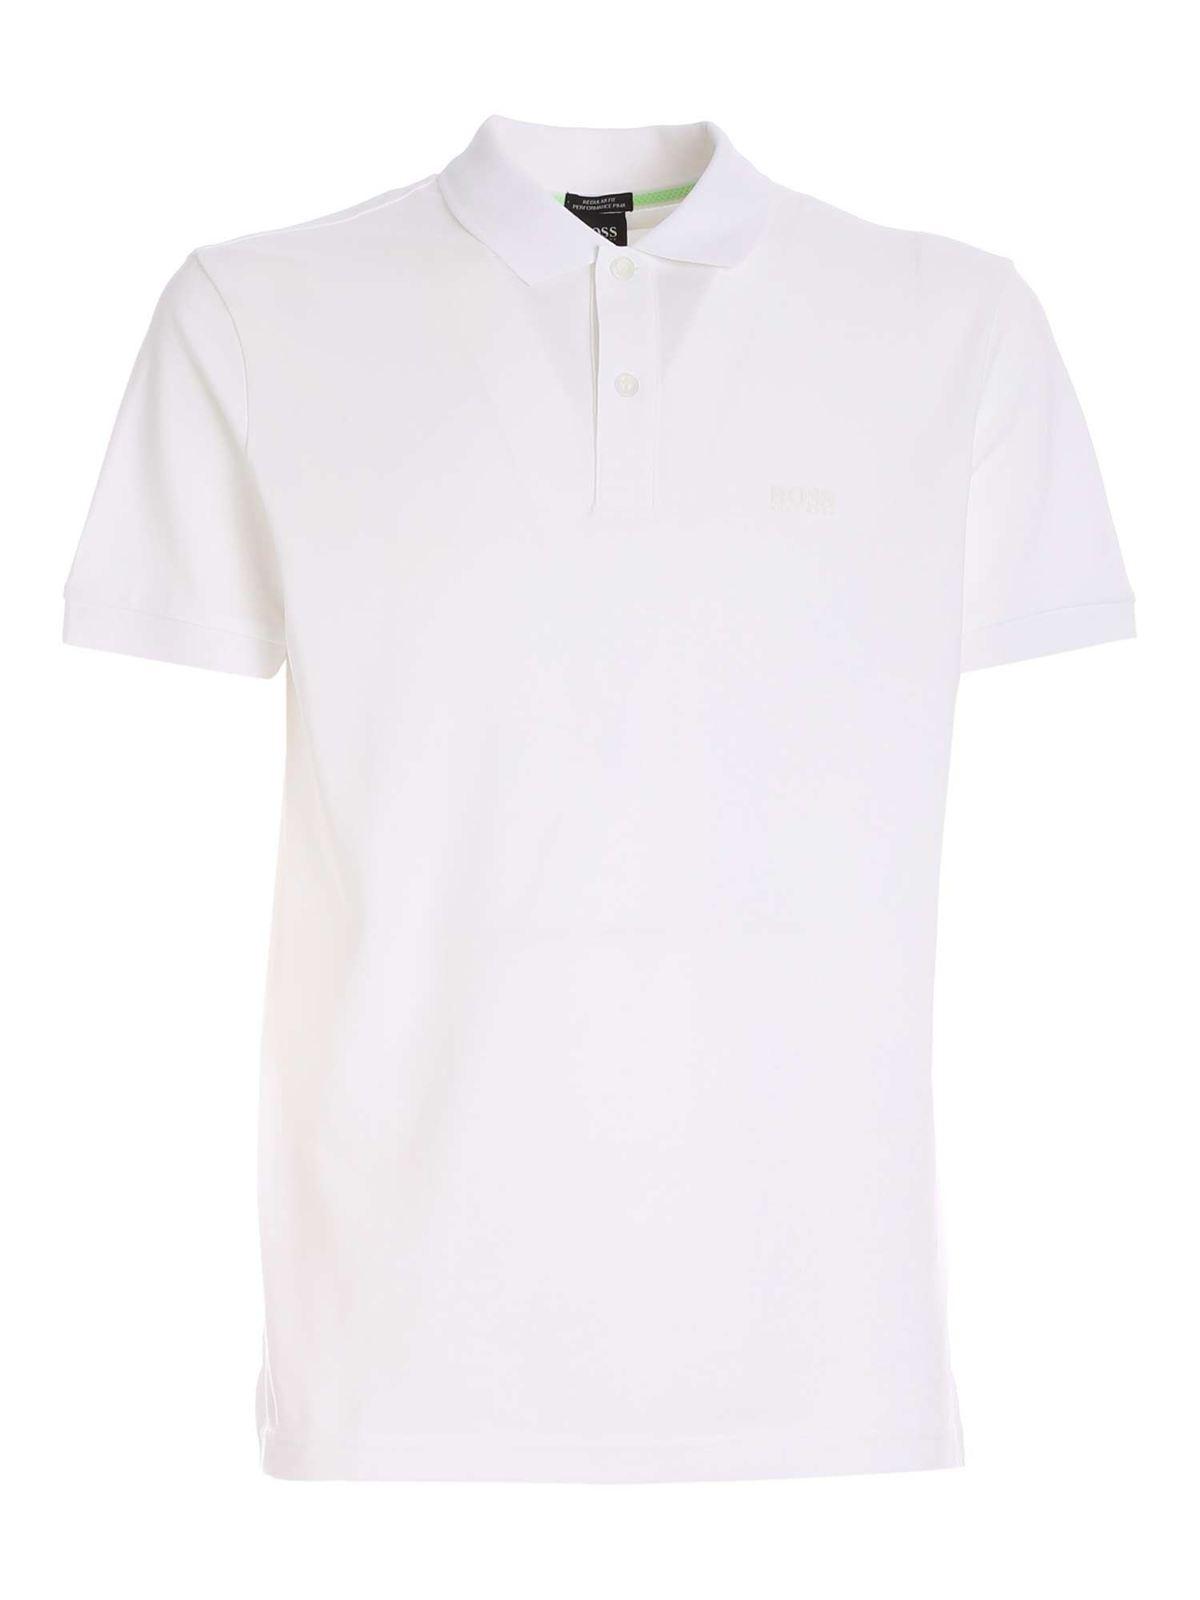 Hugo Boss Cottons PIRO POLO SHIRT IN WHITE